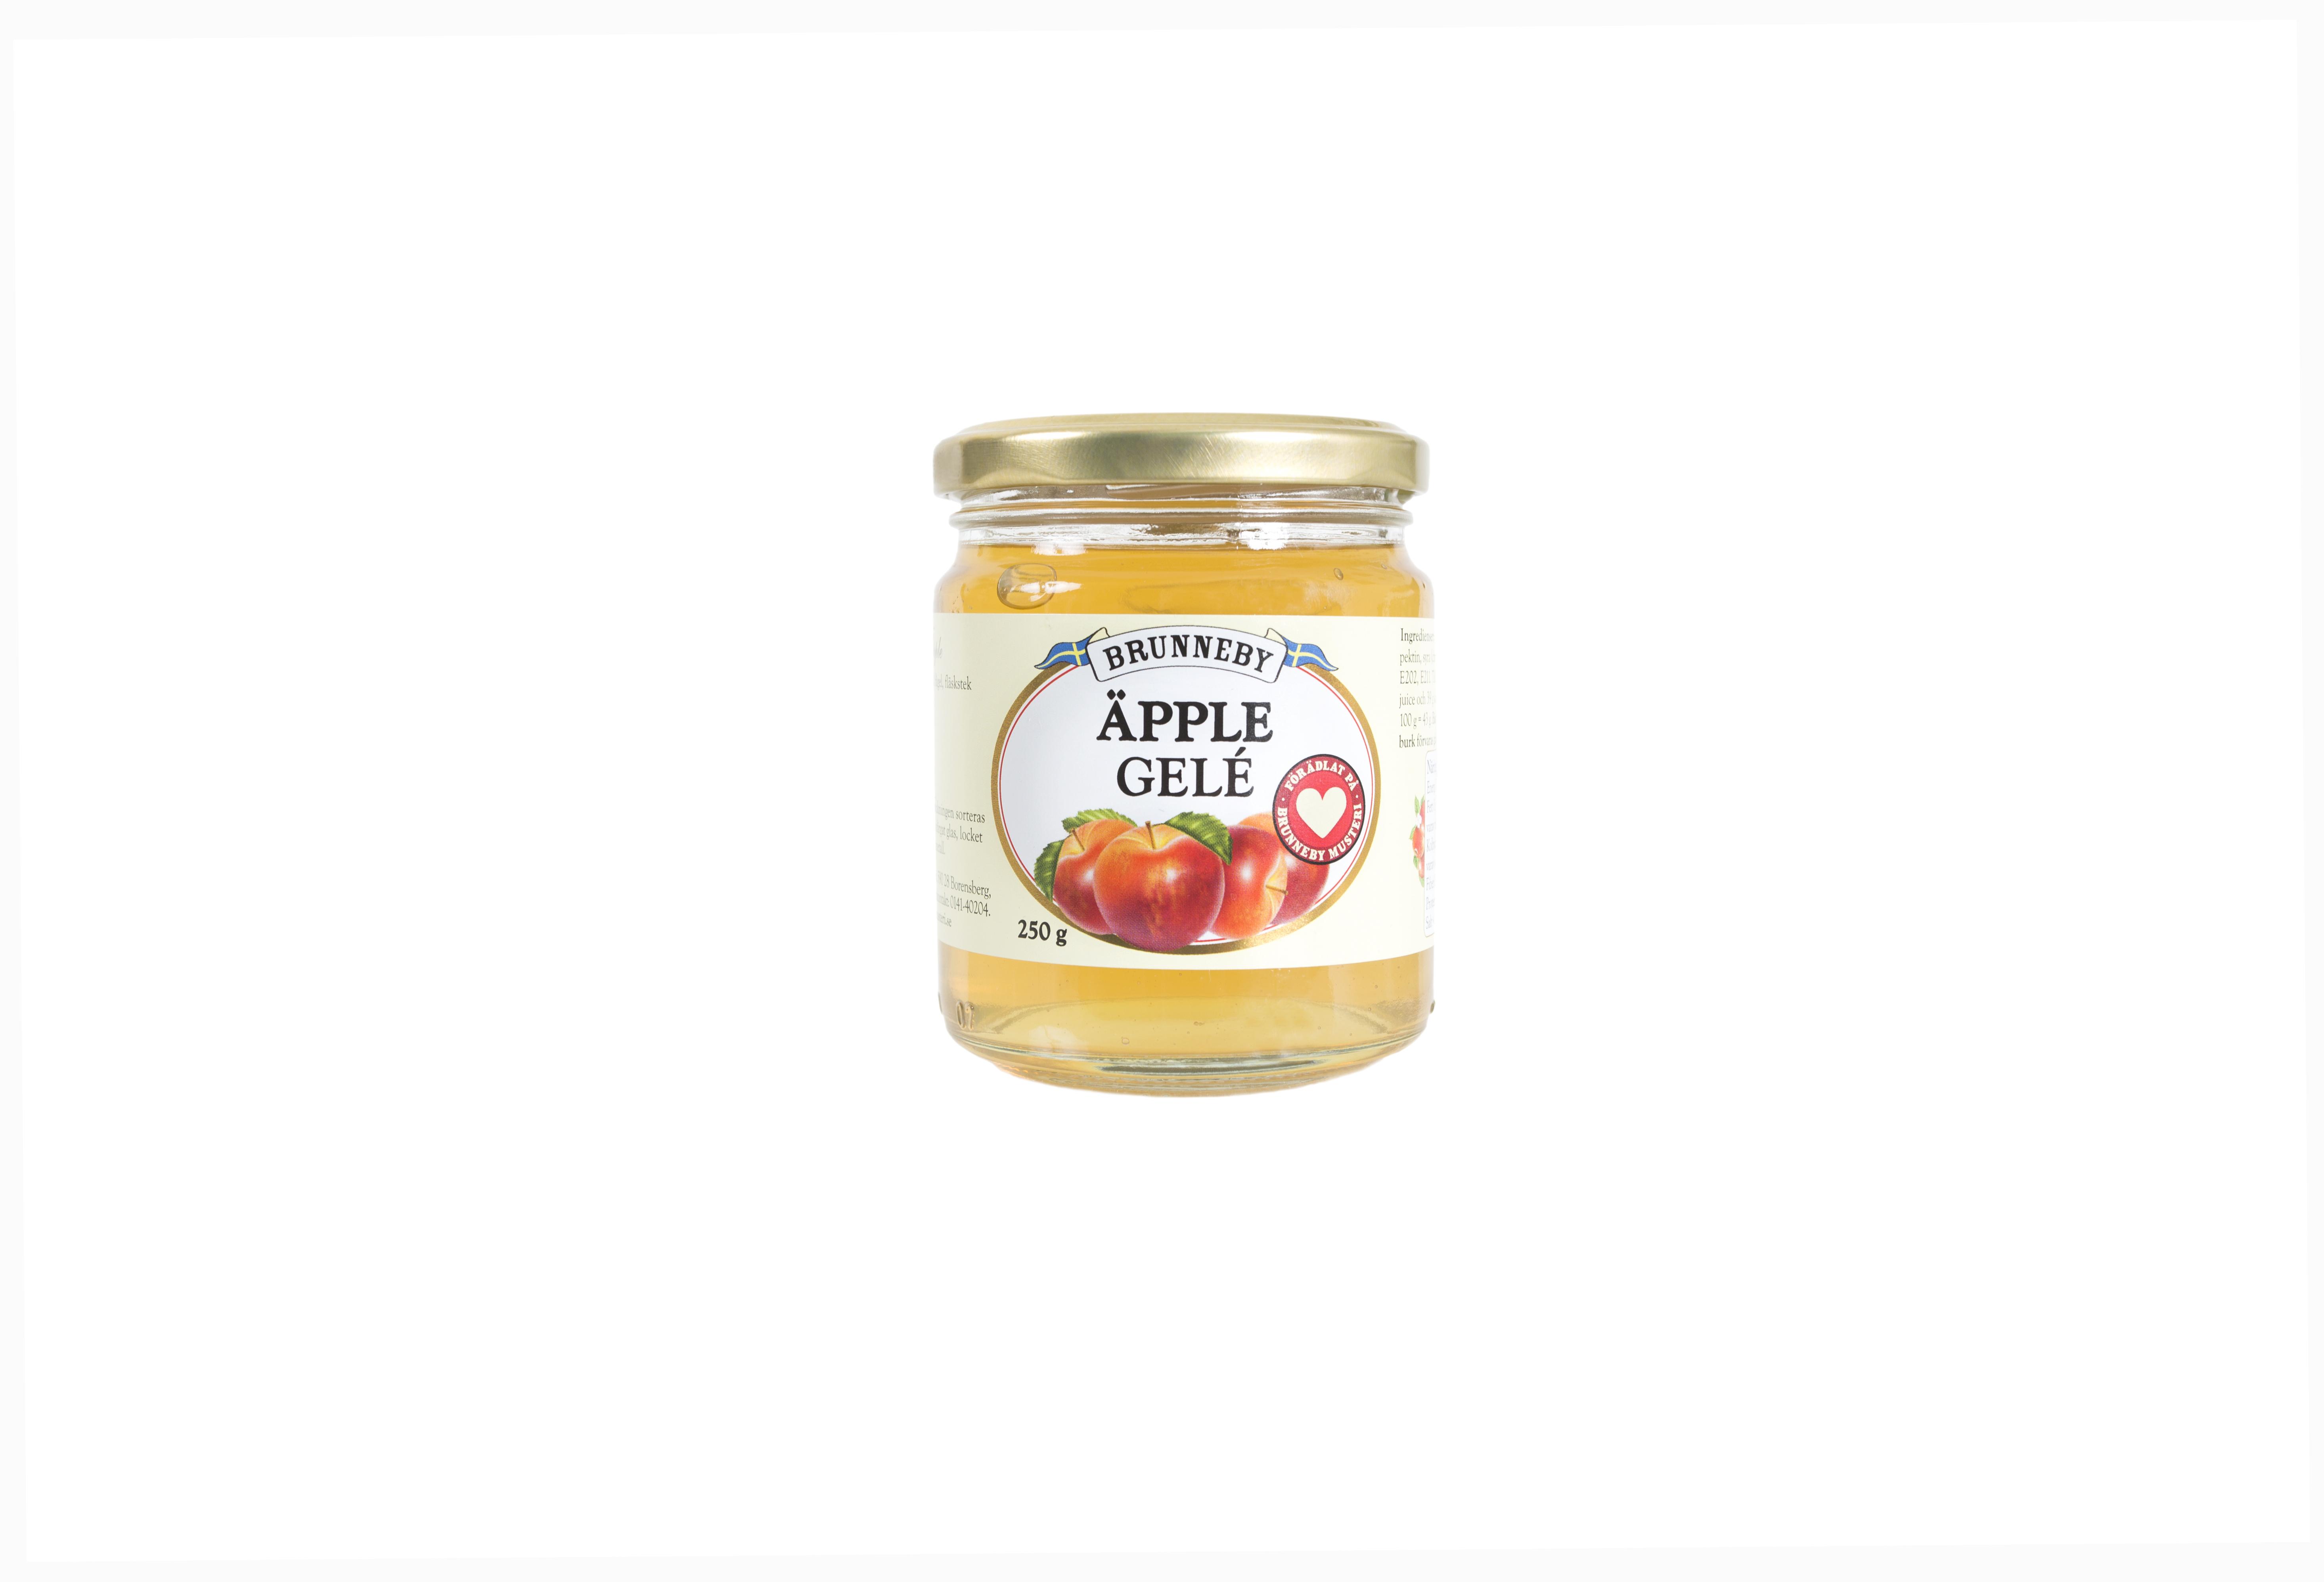 Högupplöst bild på Äpplegelé i 250 g burk.